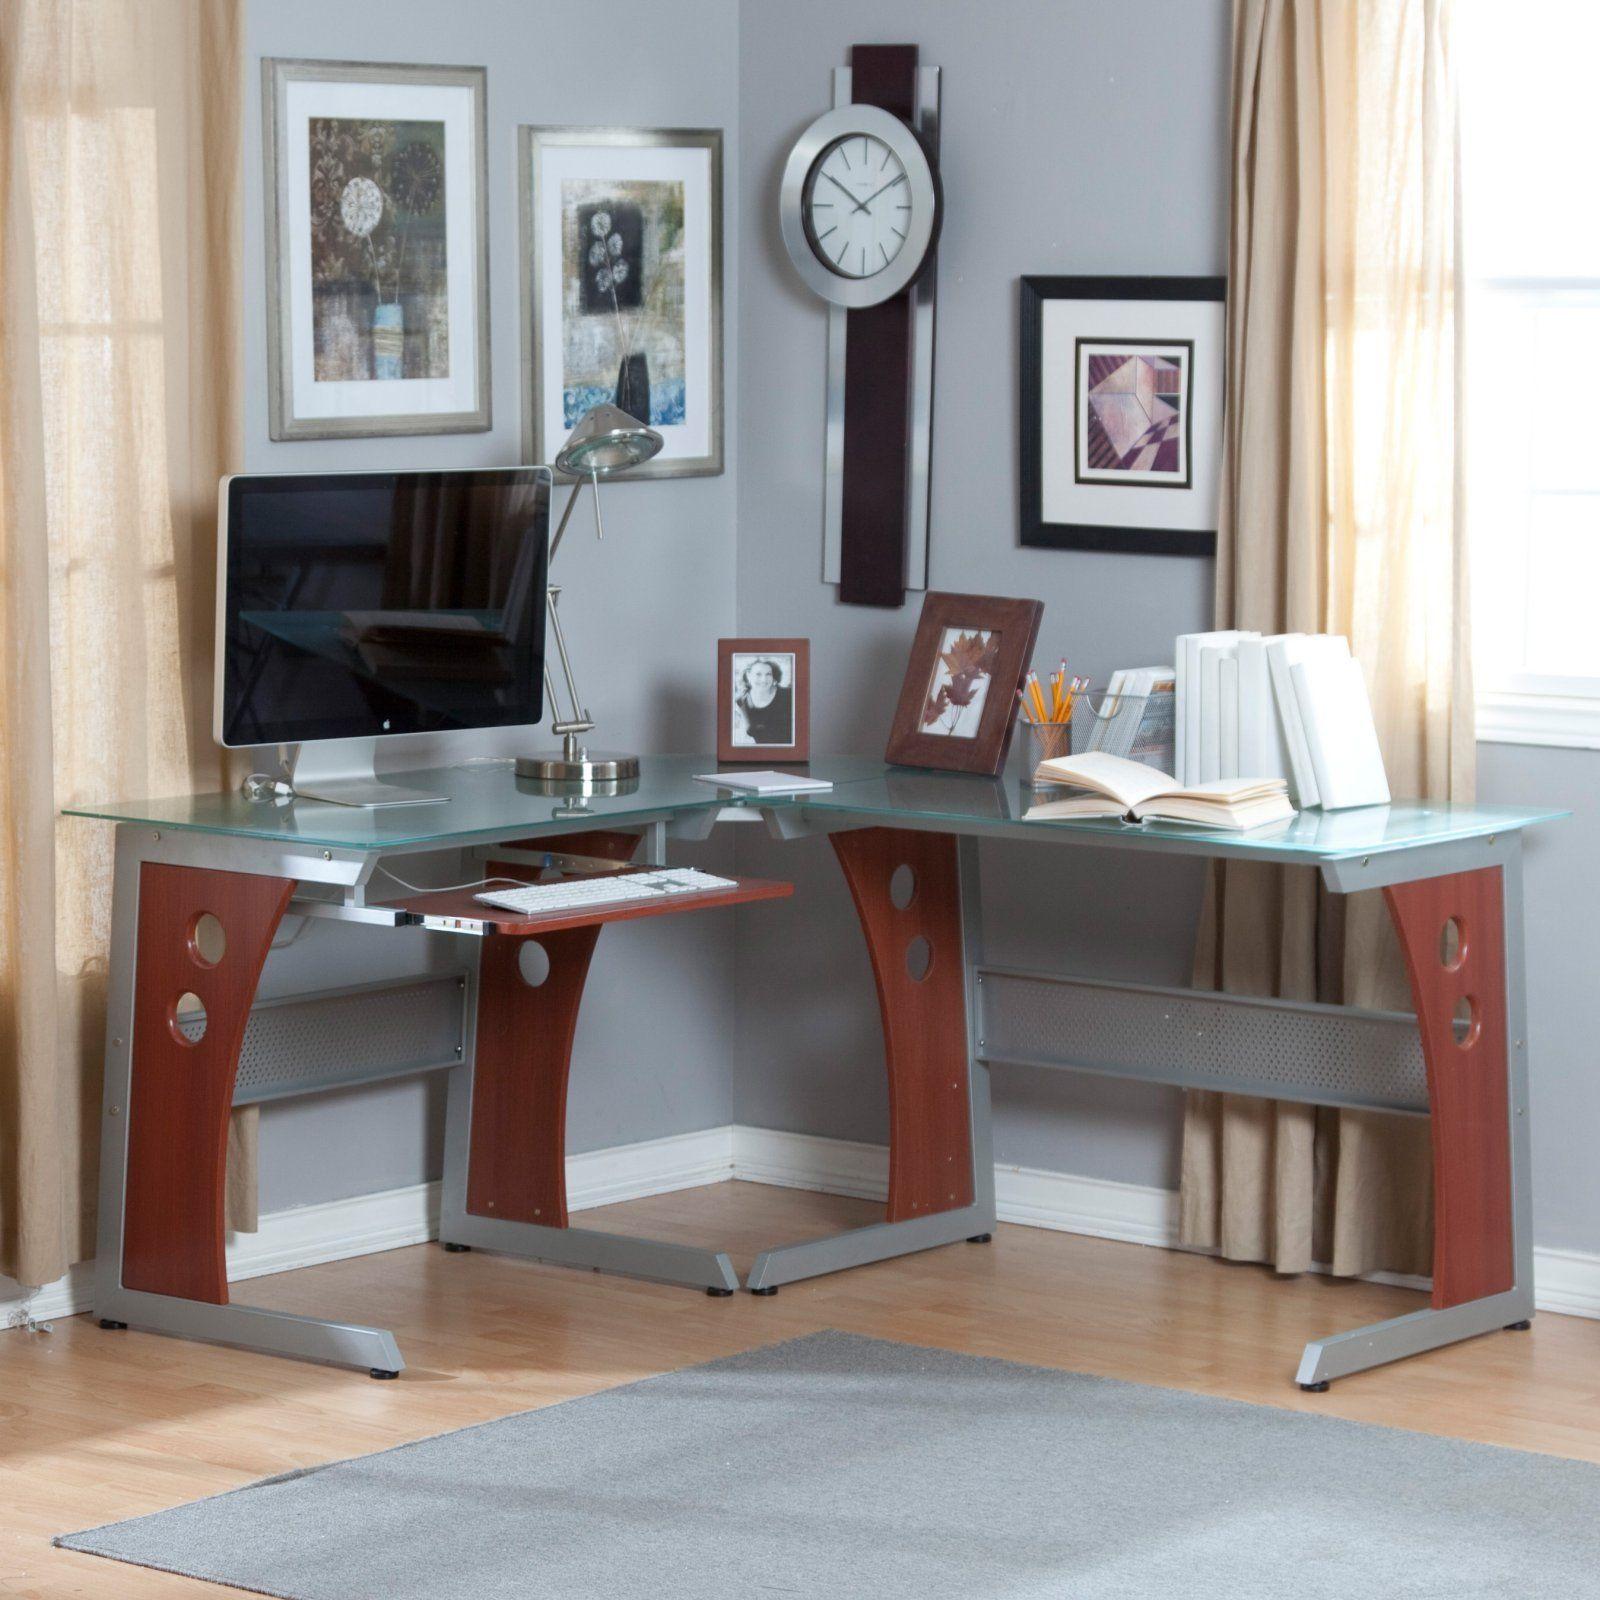 Glass Top Home Office Desk Contemporary Design Popular Of Small